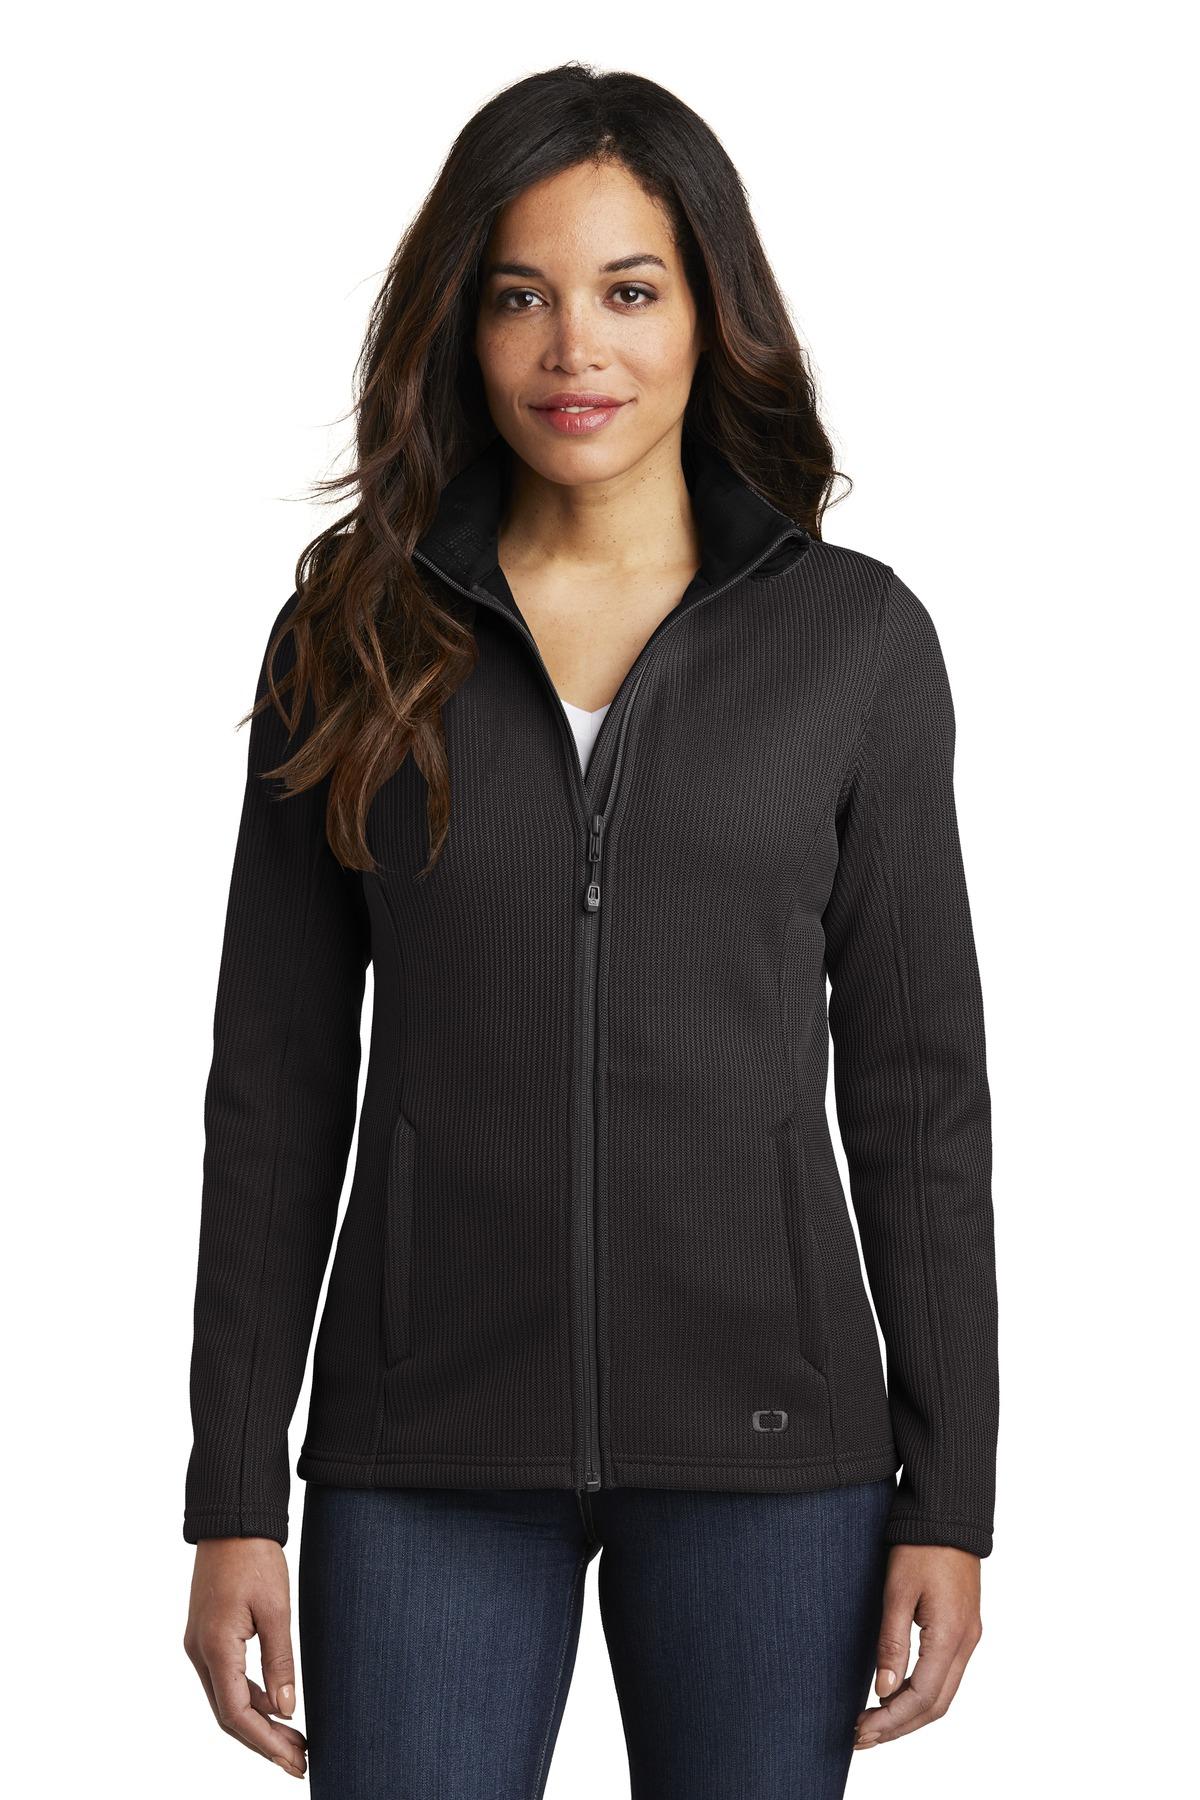 OGIO ® Ladies Grit Fleece Jacket.-OGIO